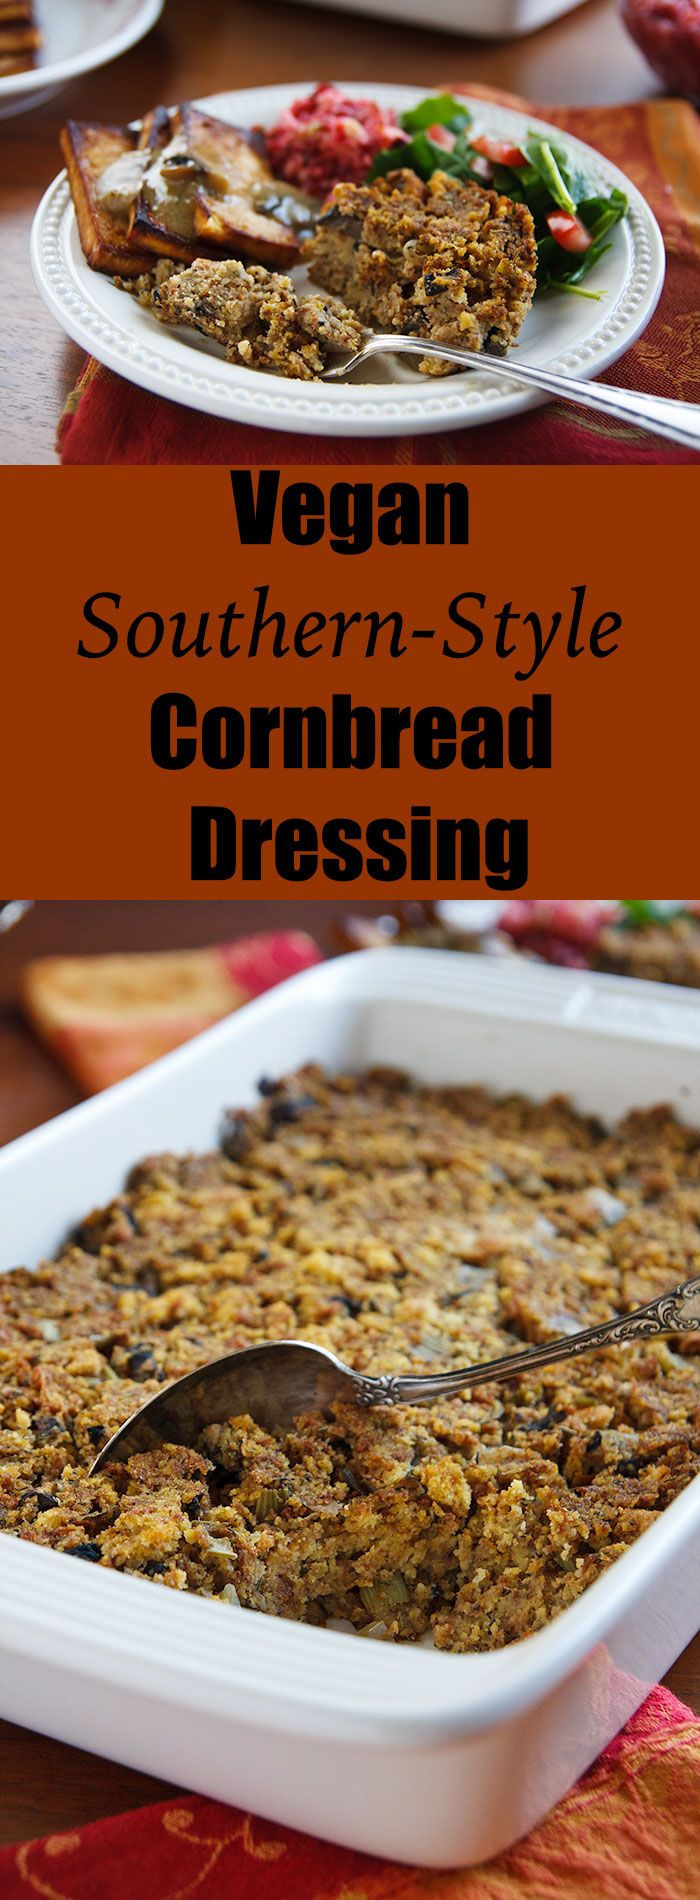 Vegan Thanksgiving Dressing  Vegan Southern Style Cornbread Dressing Recipe